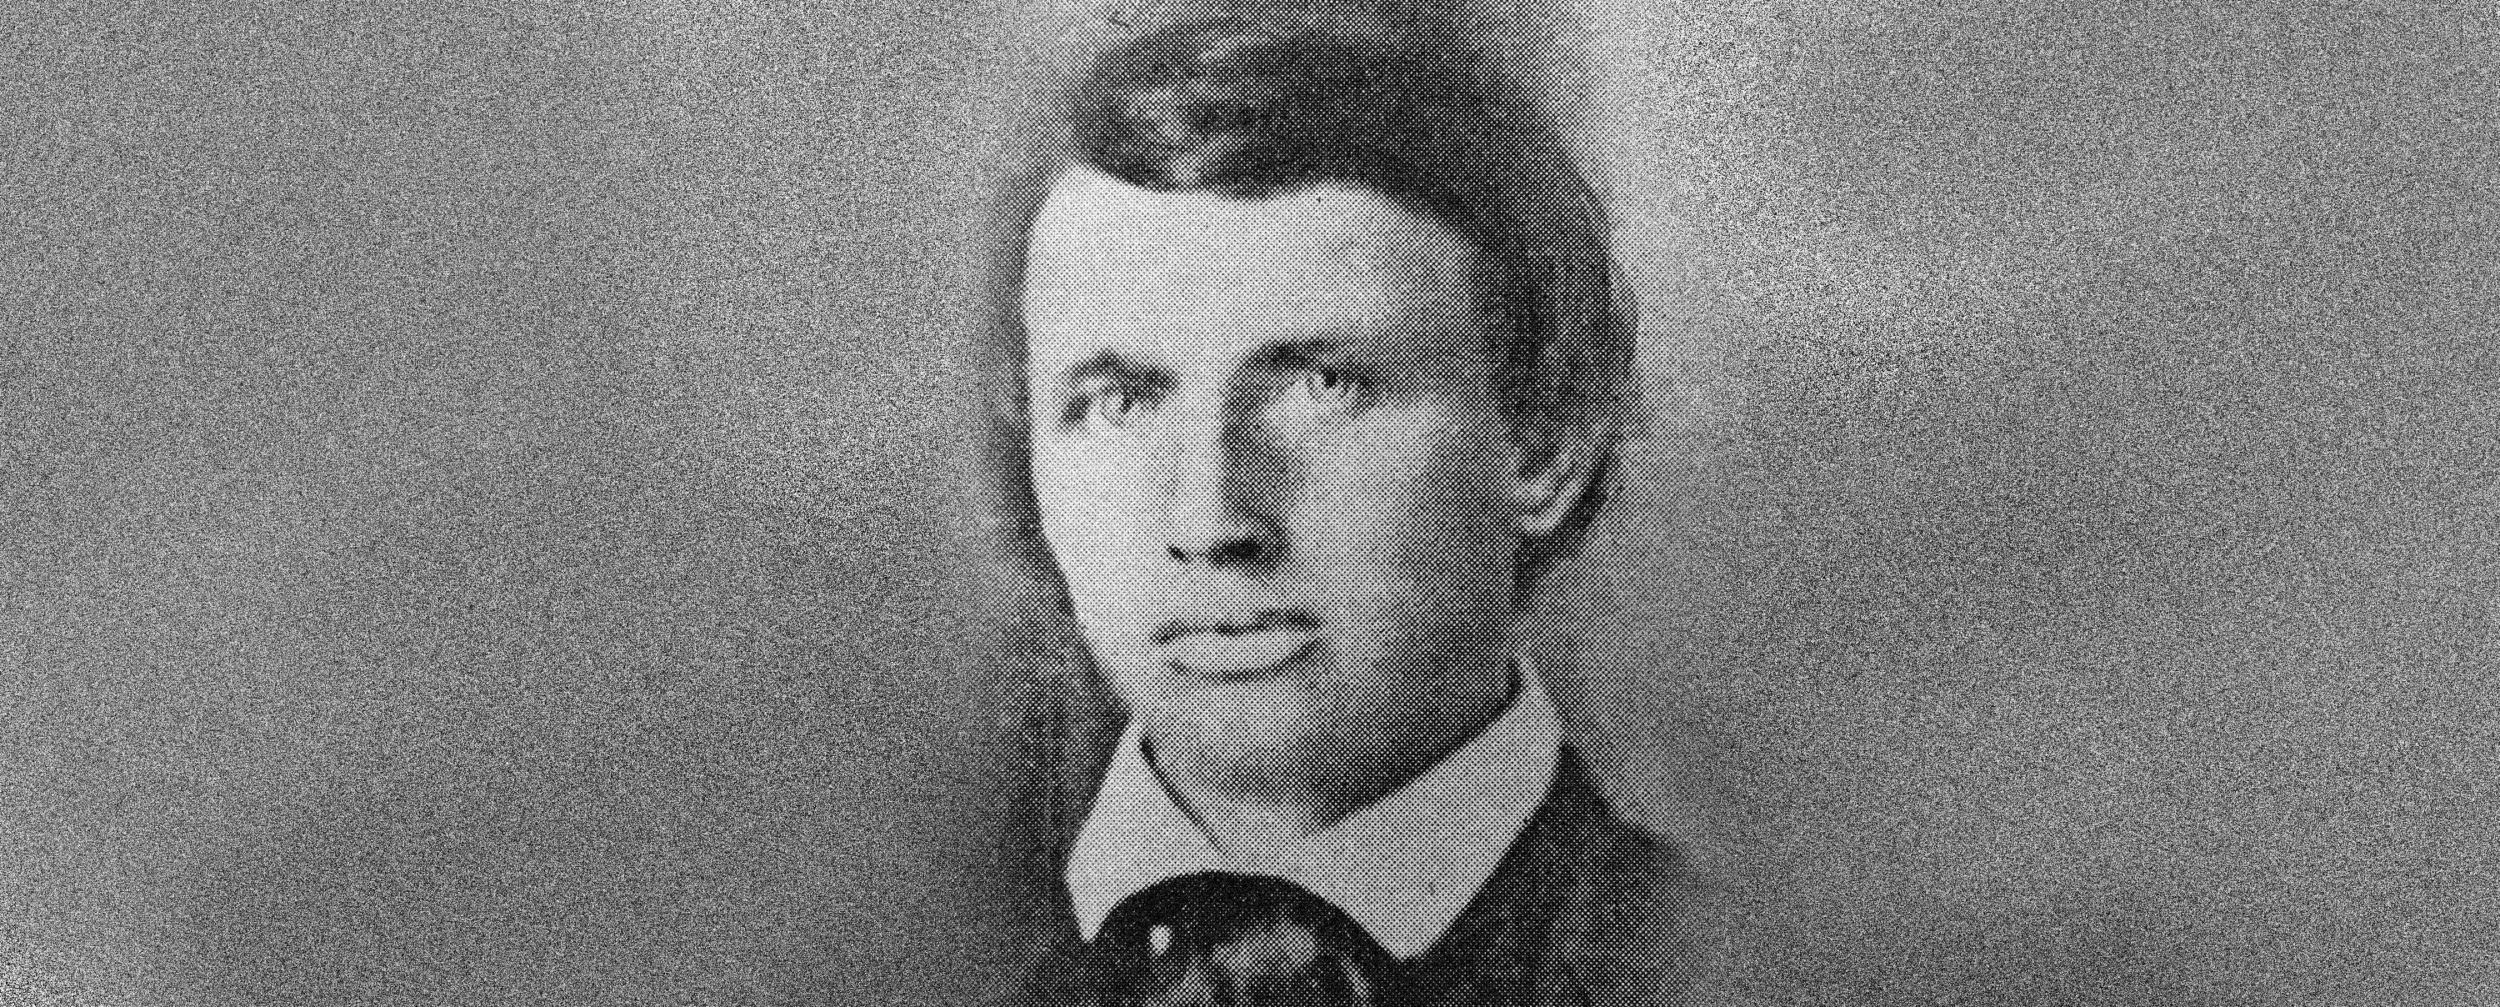 Judson Collins